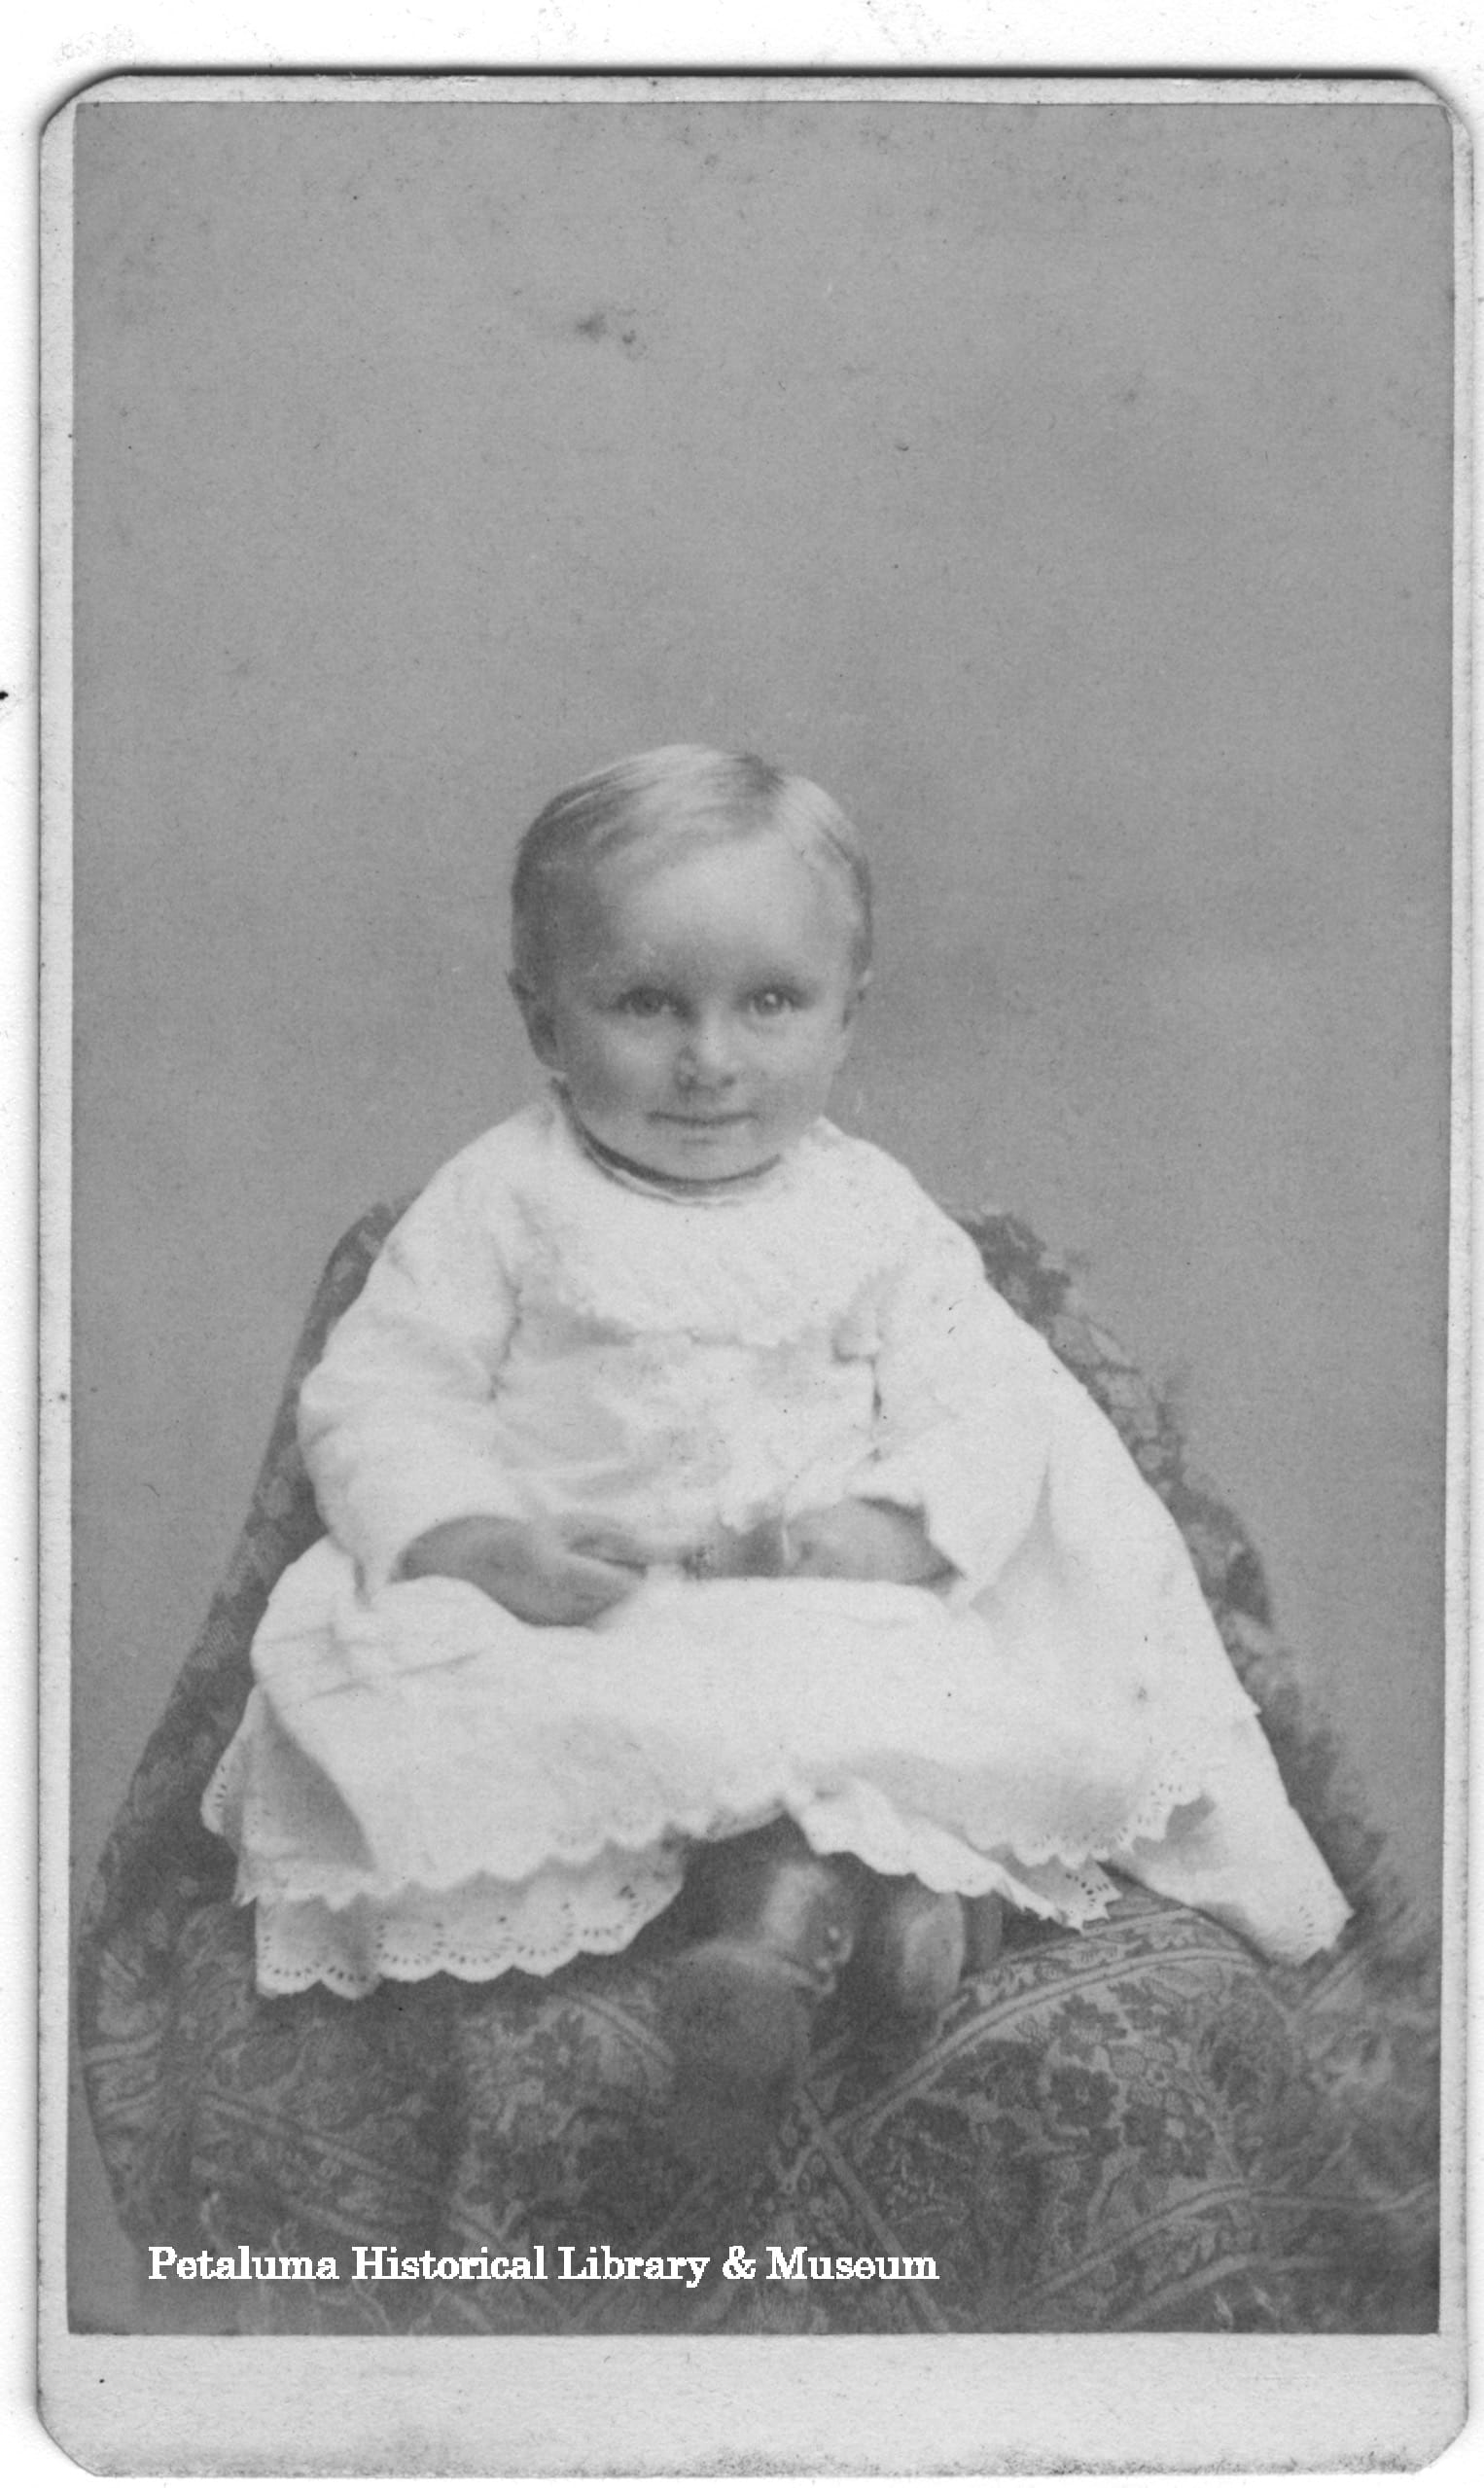 unidentified-infant-1979-425-03-p27-p14-side-a.jpg